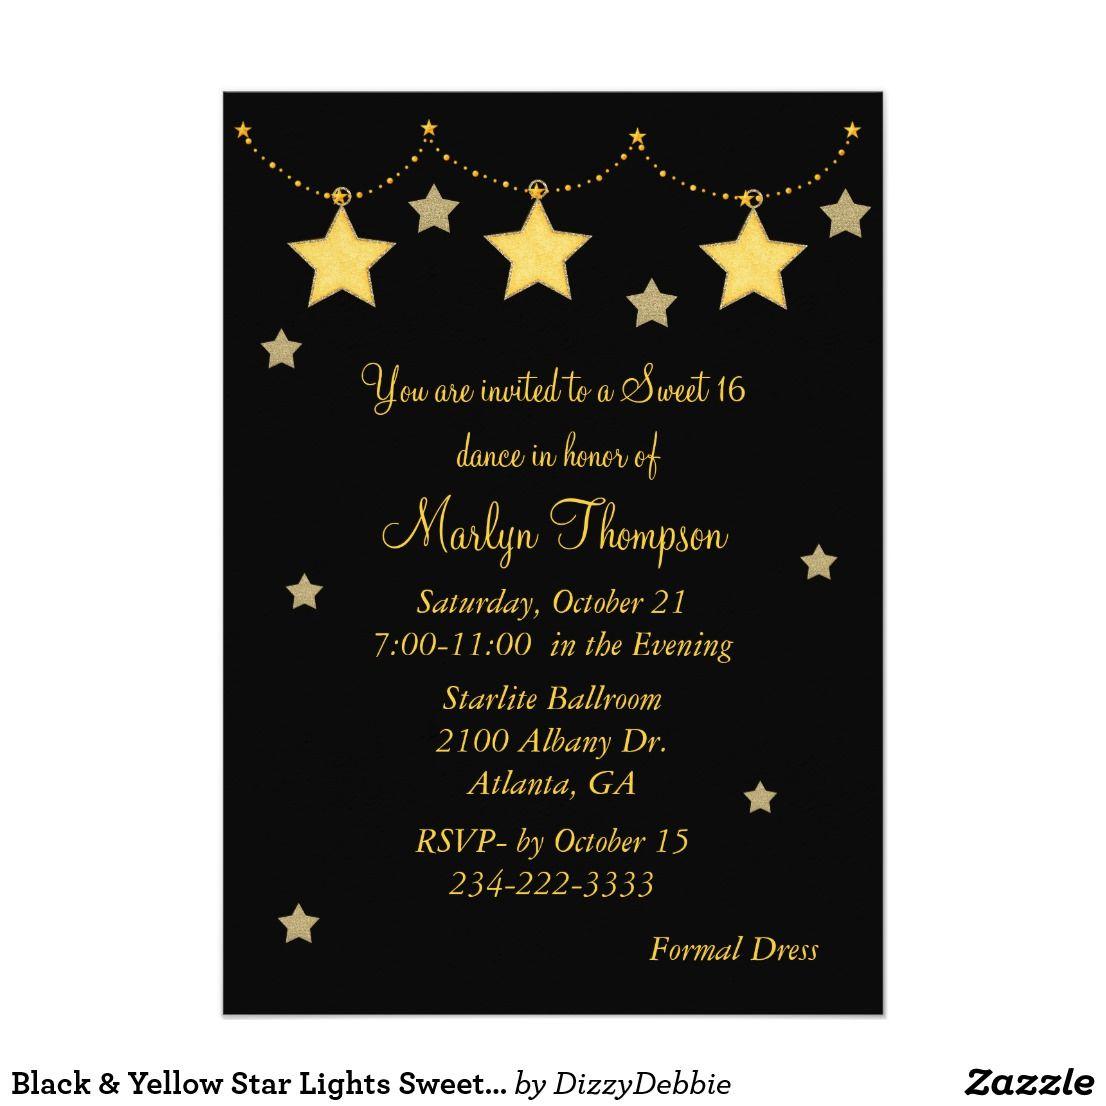 Black & Yellow Star Lights Sweet 16 Invitation Pretty yellow and ...